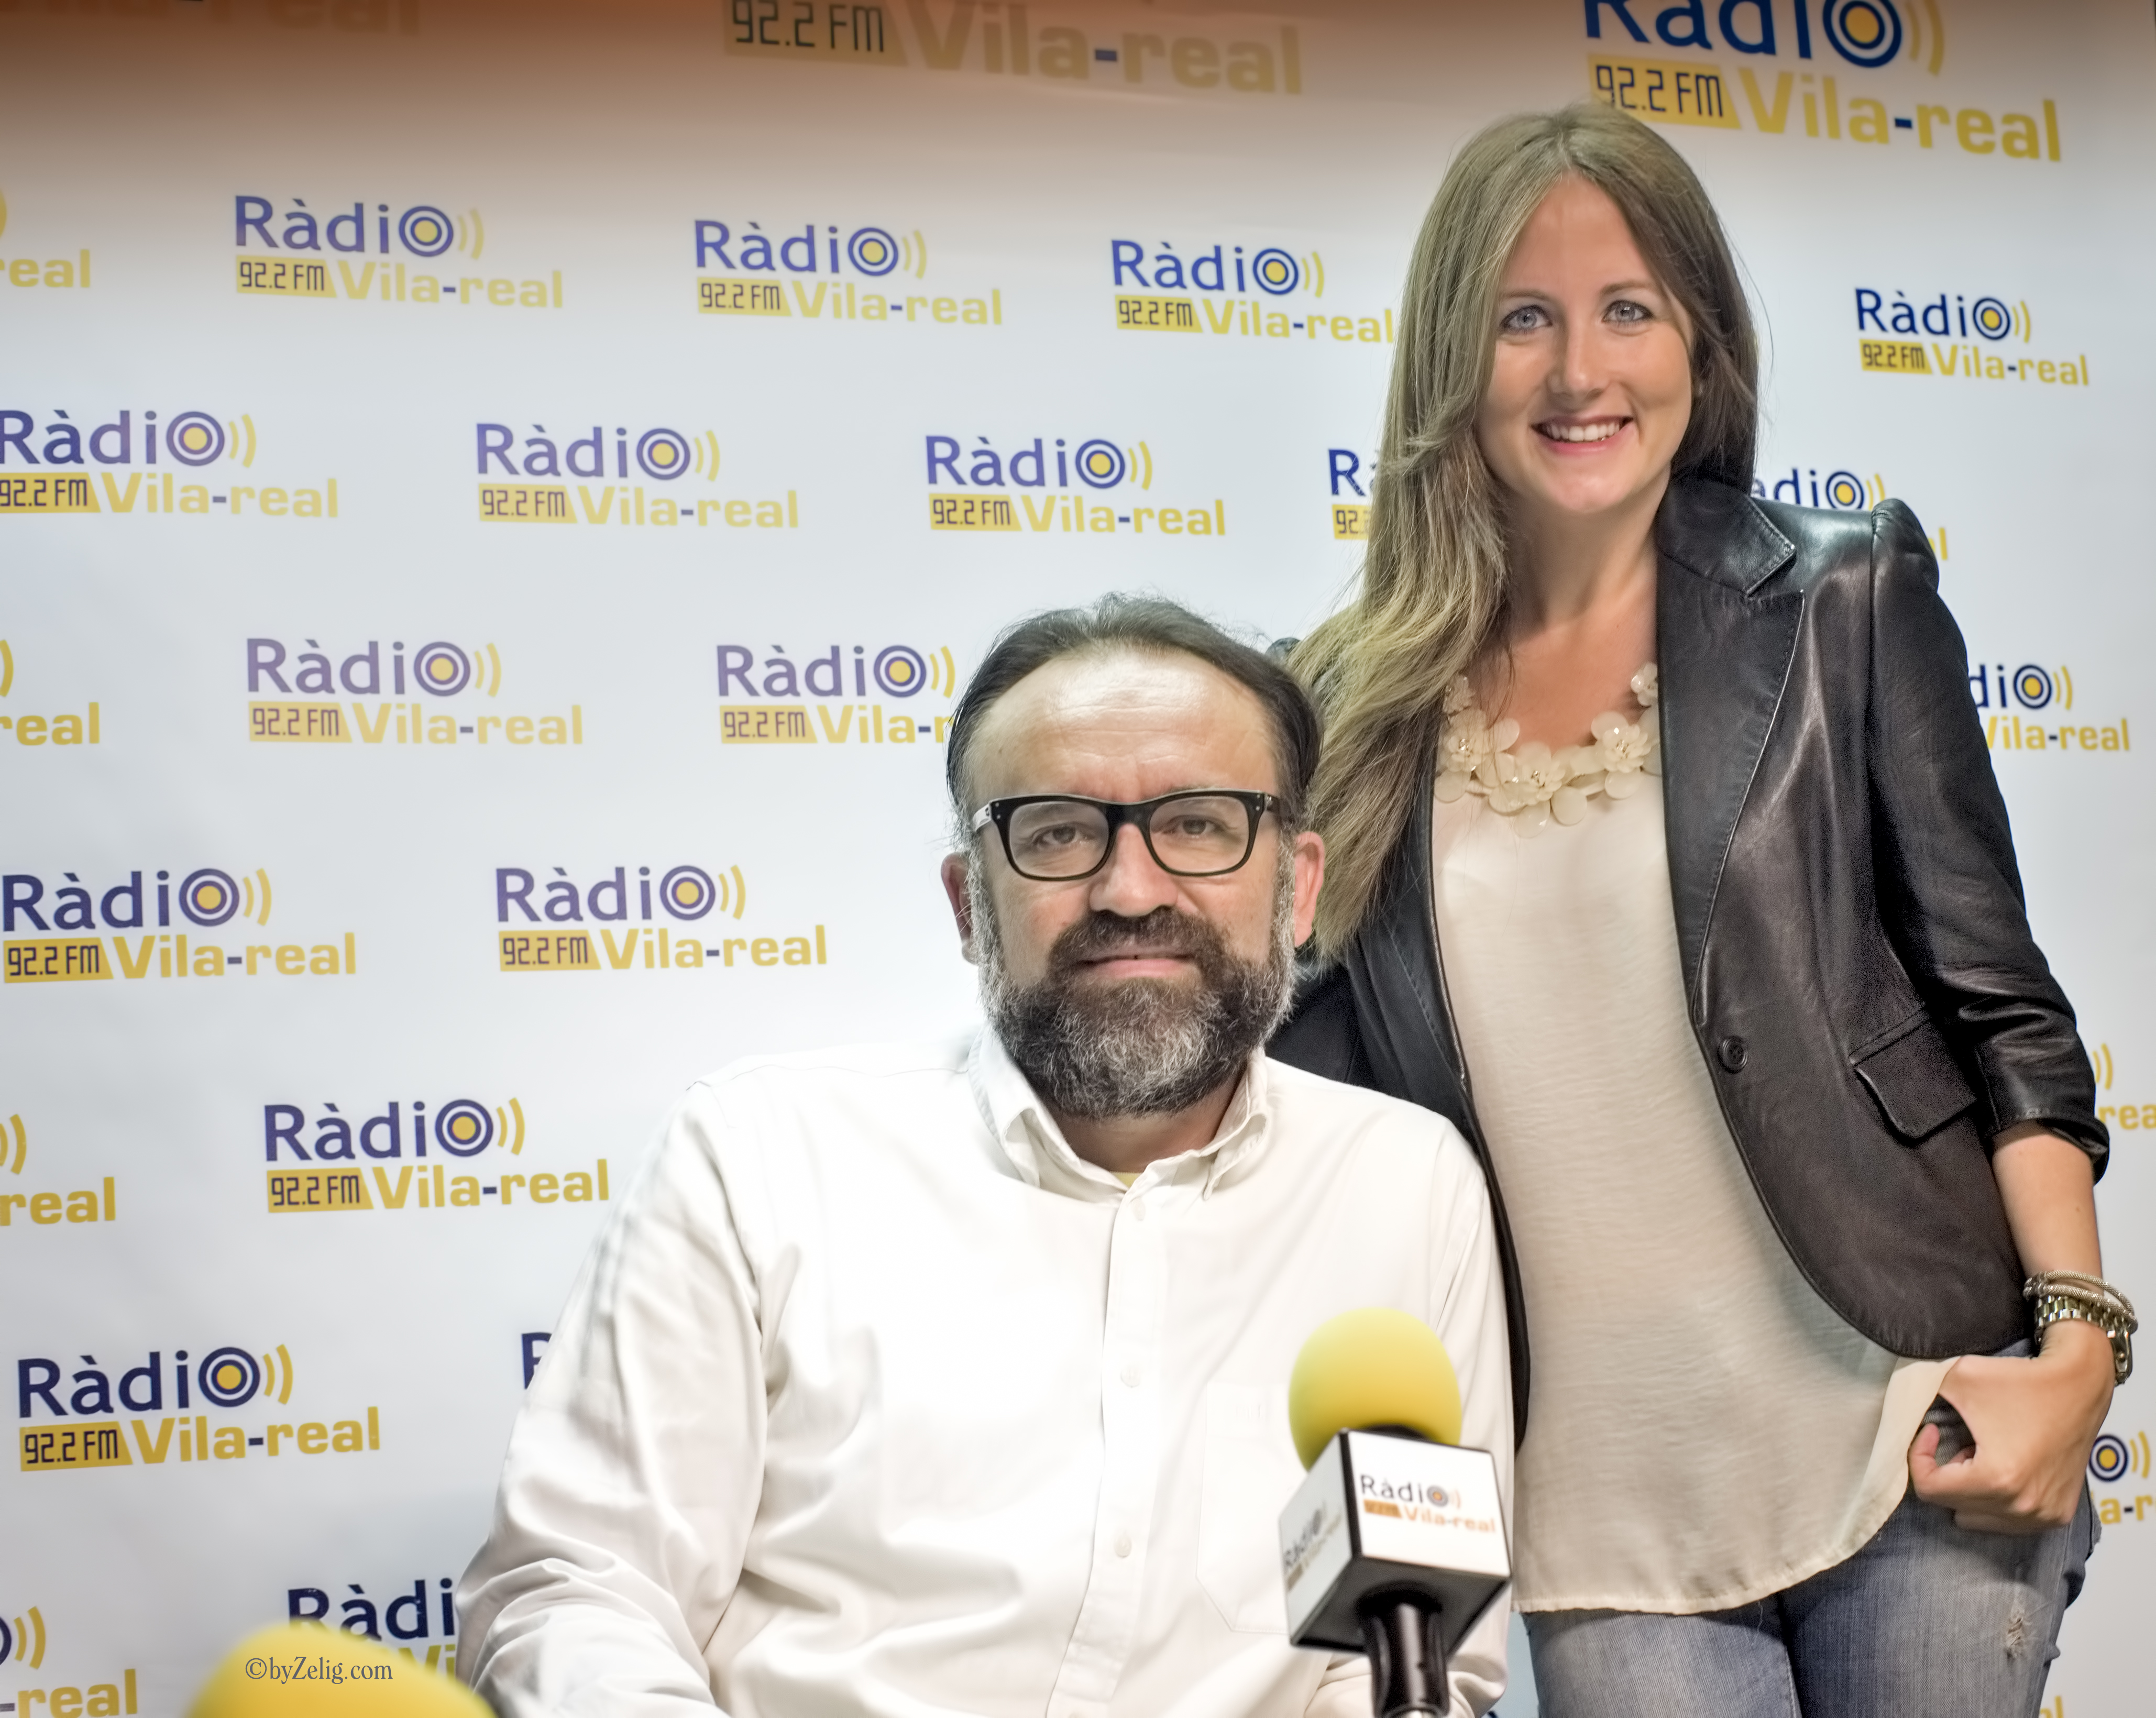 Esports Radio Vila-real. Programa del 12 de diciembre 2017